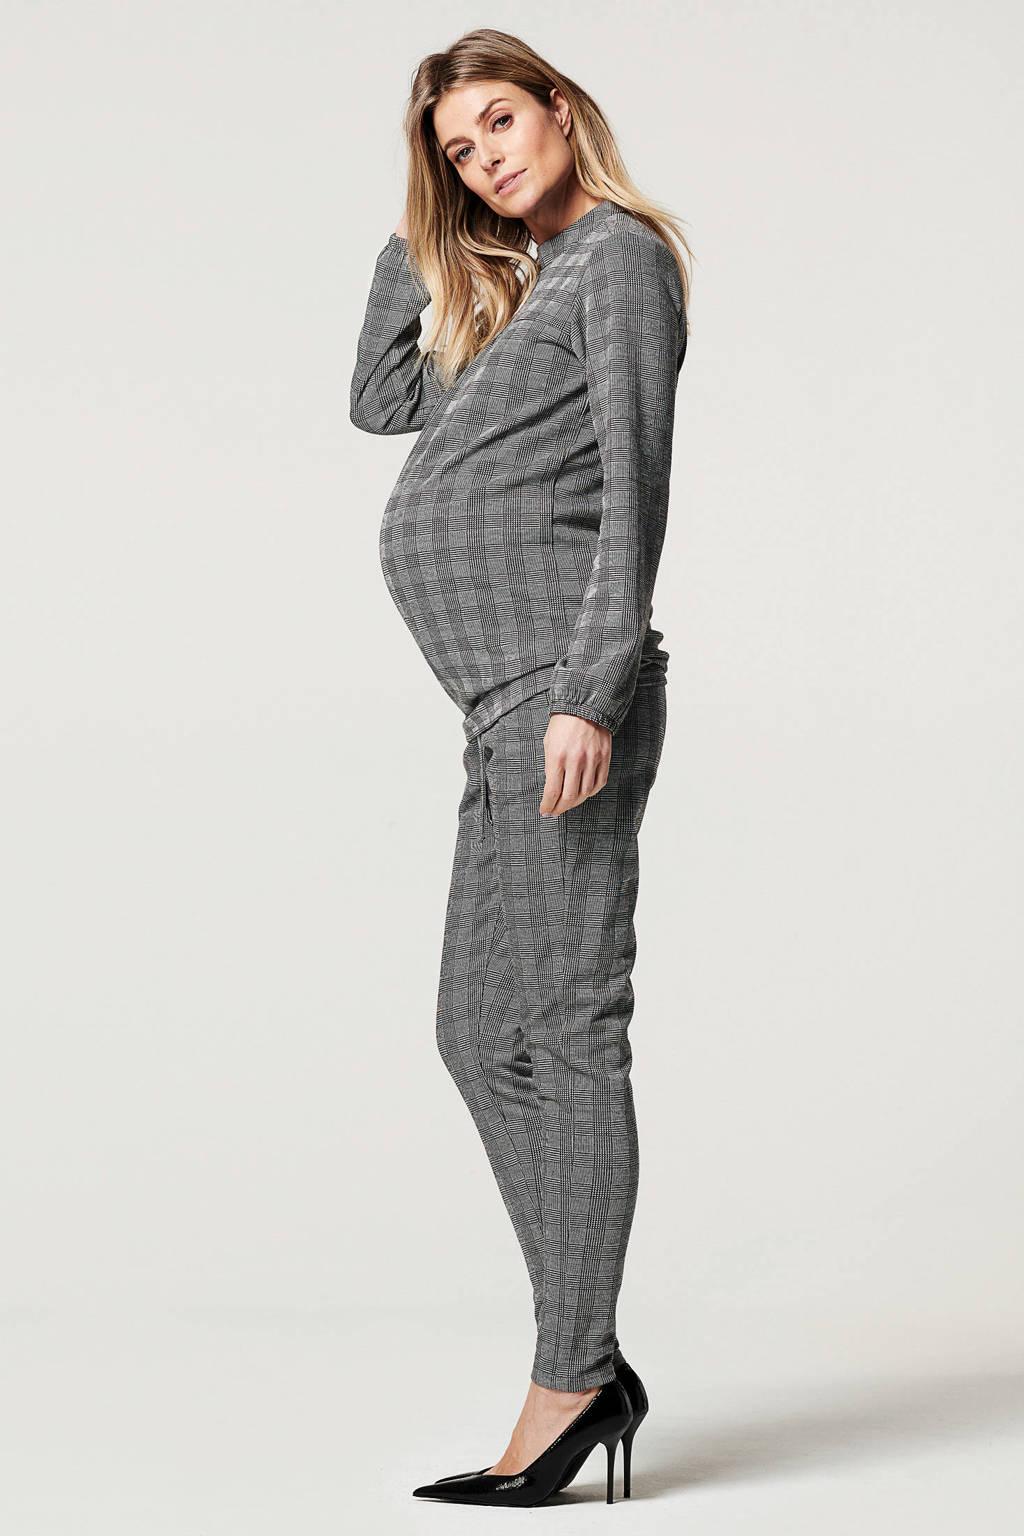 Noppies geruite low waist skinny zwangerschapsbroek Corbridge zwart/wit, Zwart/wit